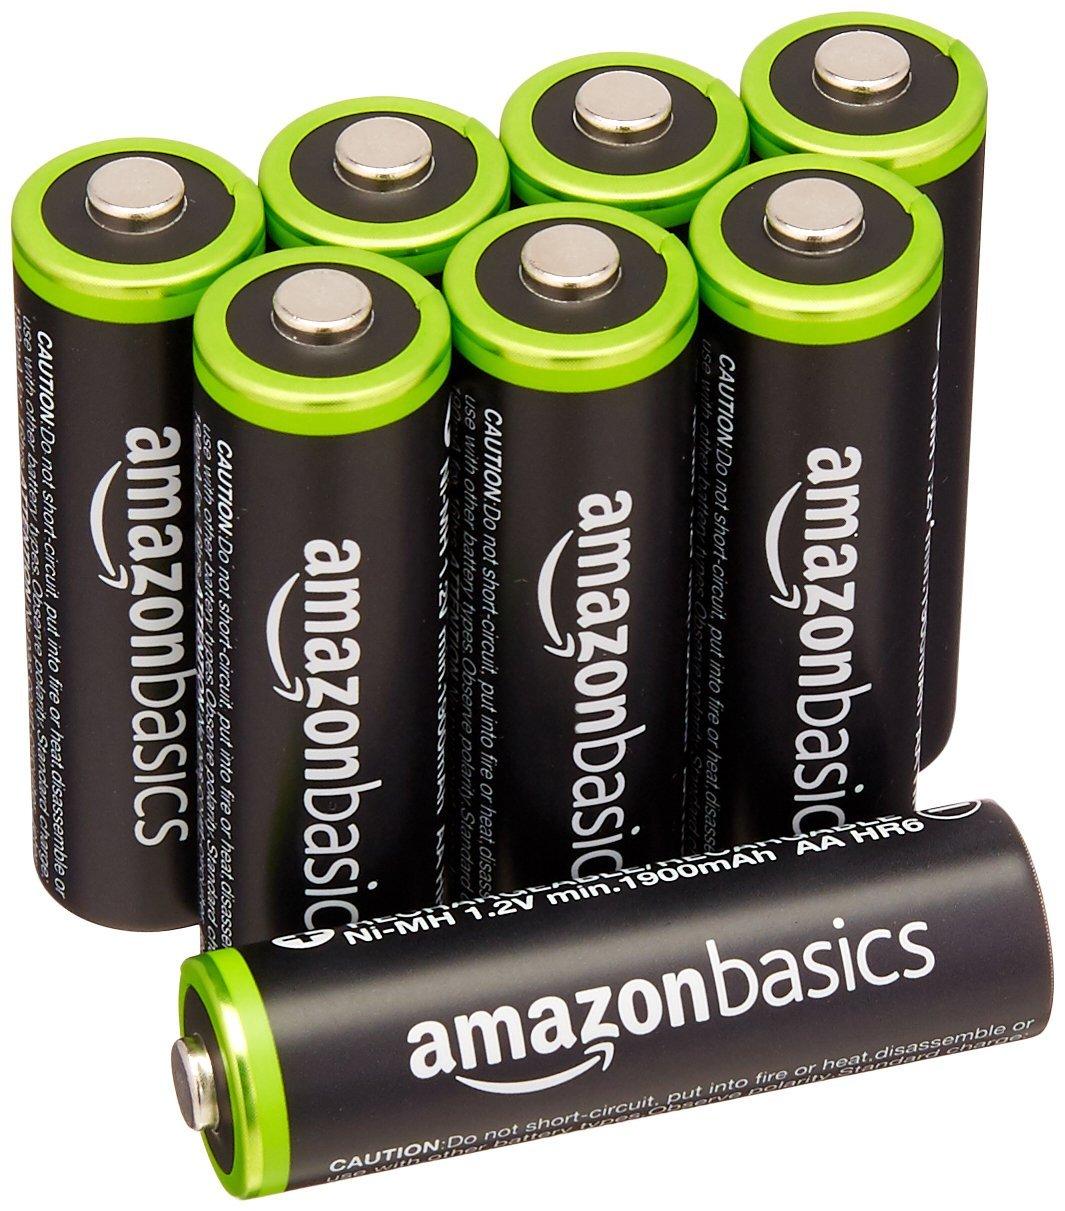 Basics Aa Rechargeable Solar Light Batteries